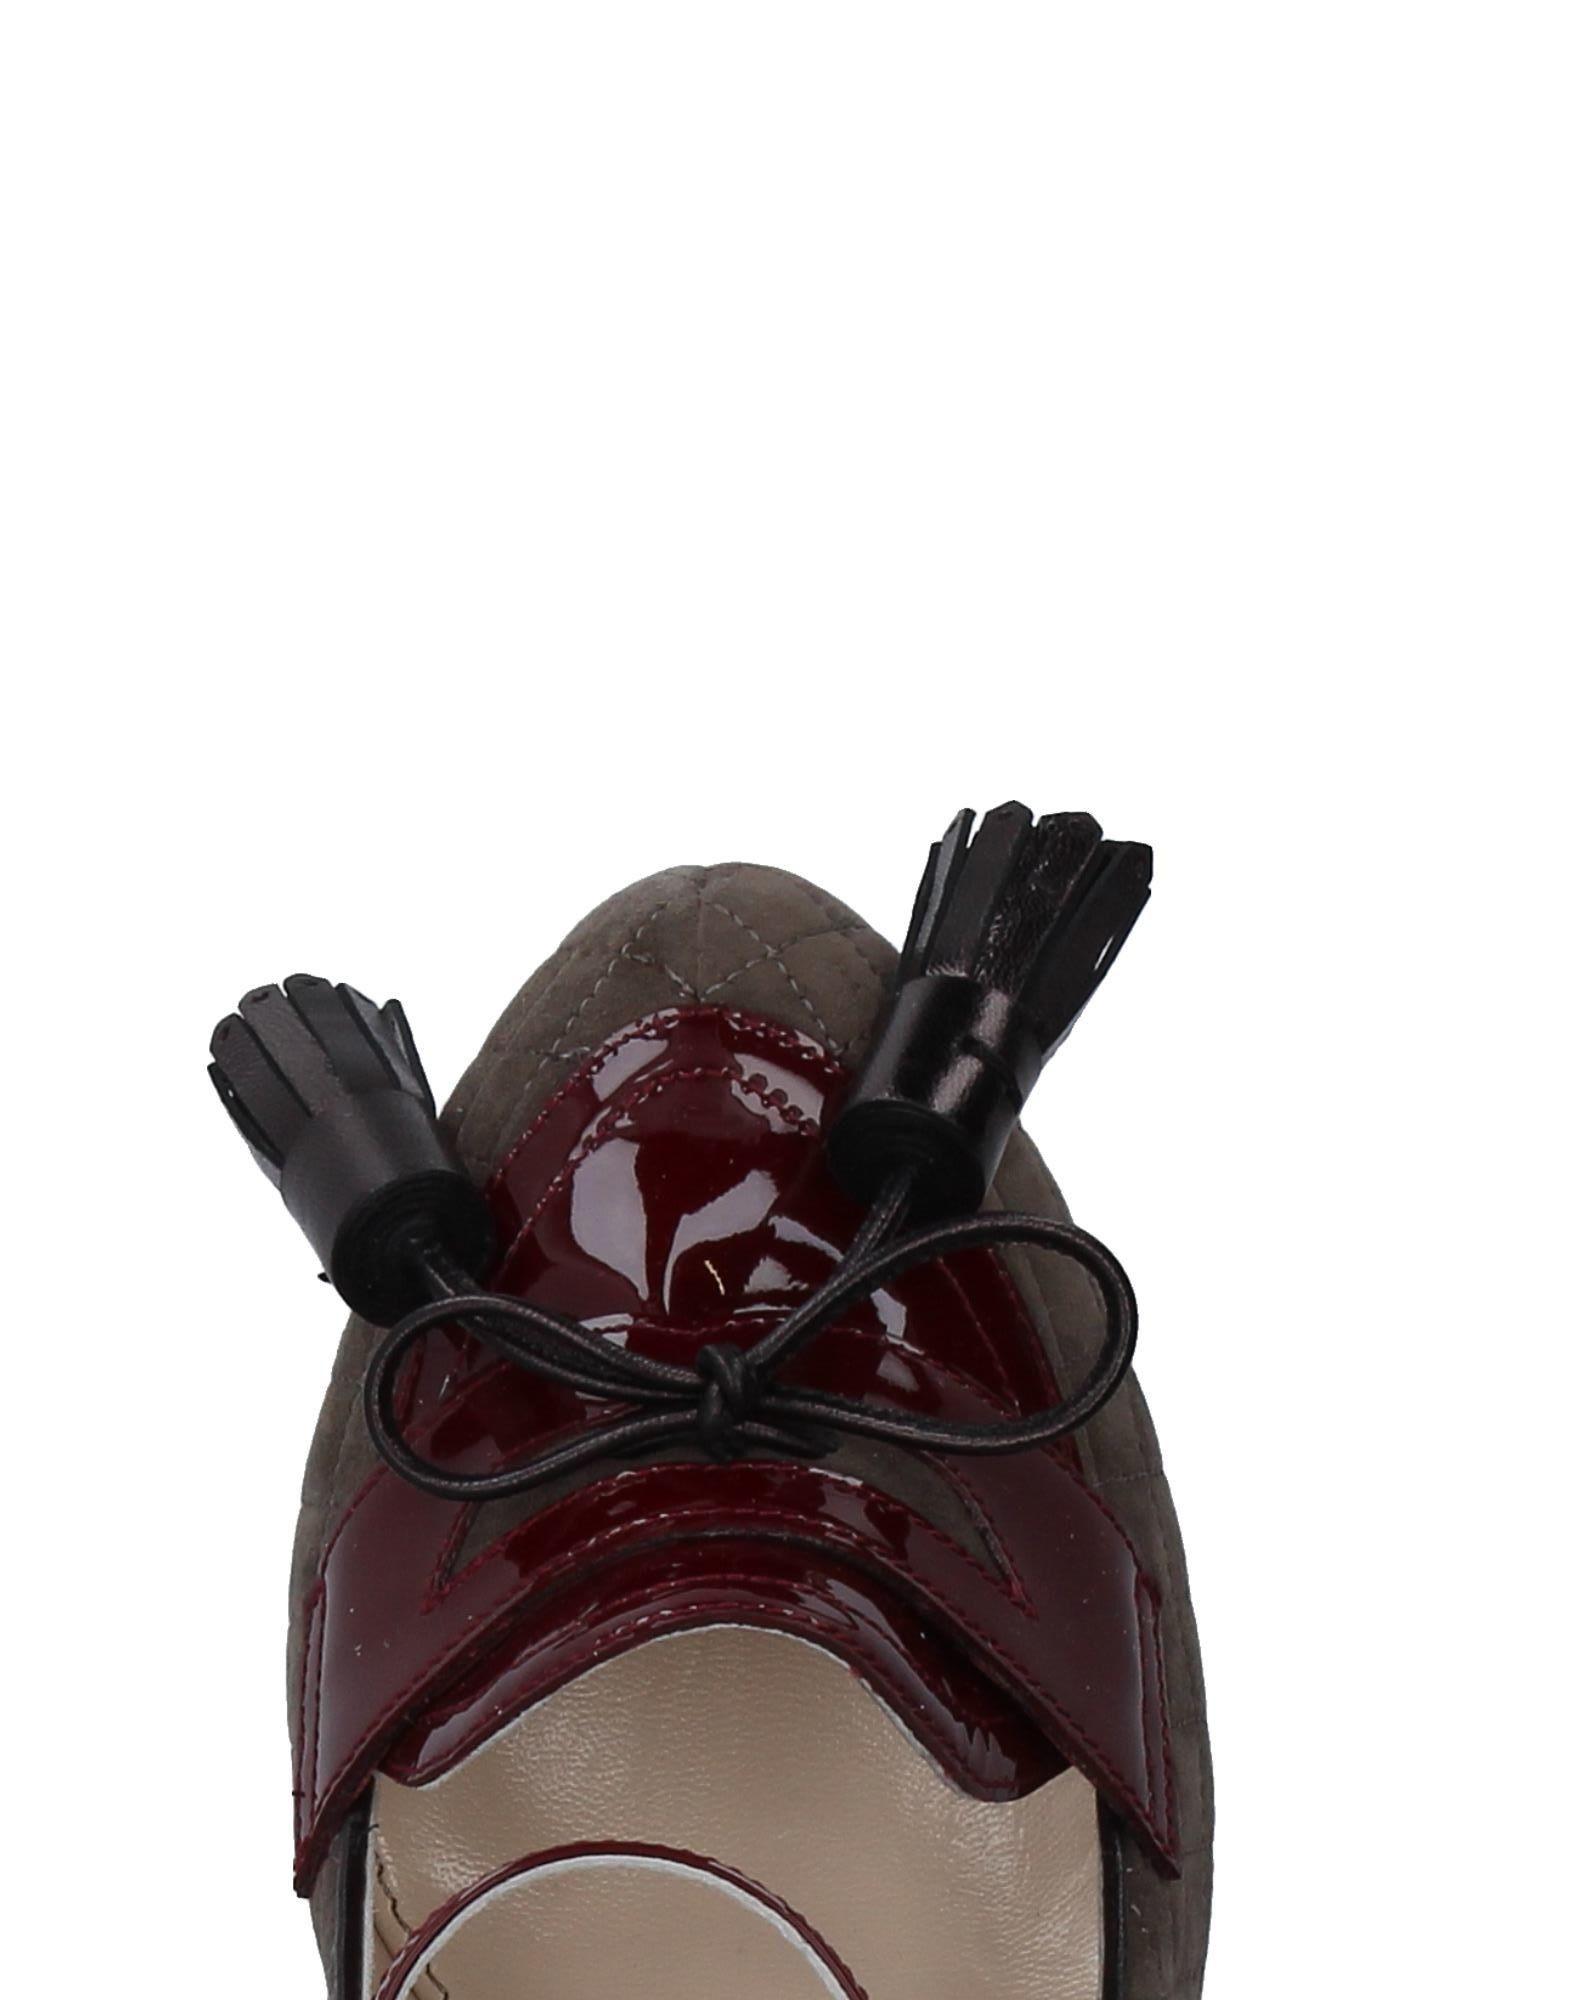 Stilvolle Mokassins billige Schuhe John Galliano Mokassins Stilvolle Damen  11361973CA 3382ef